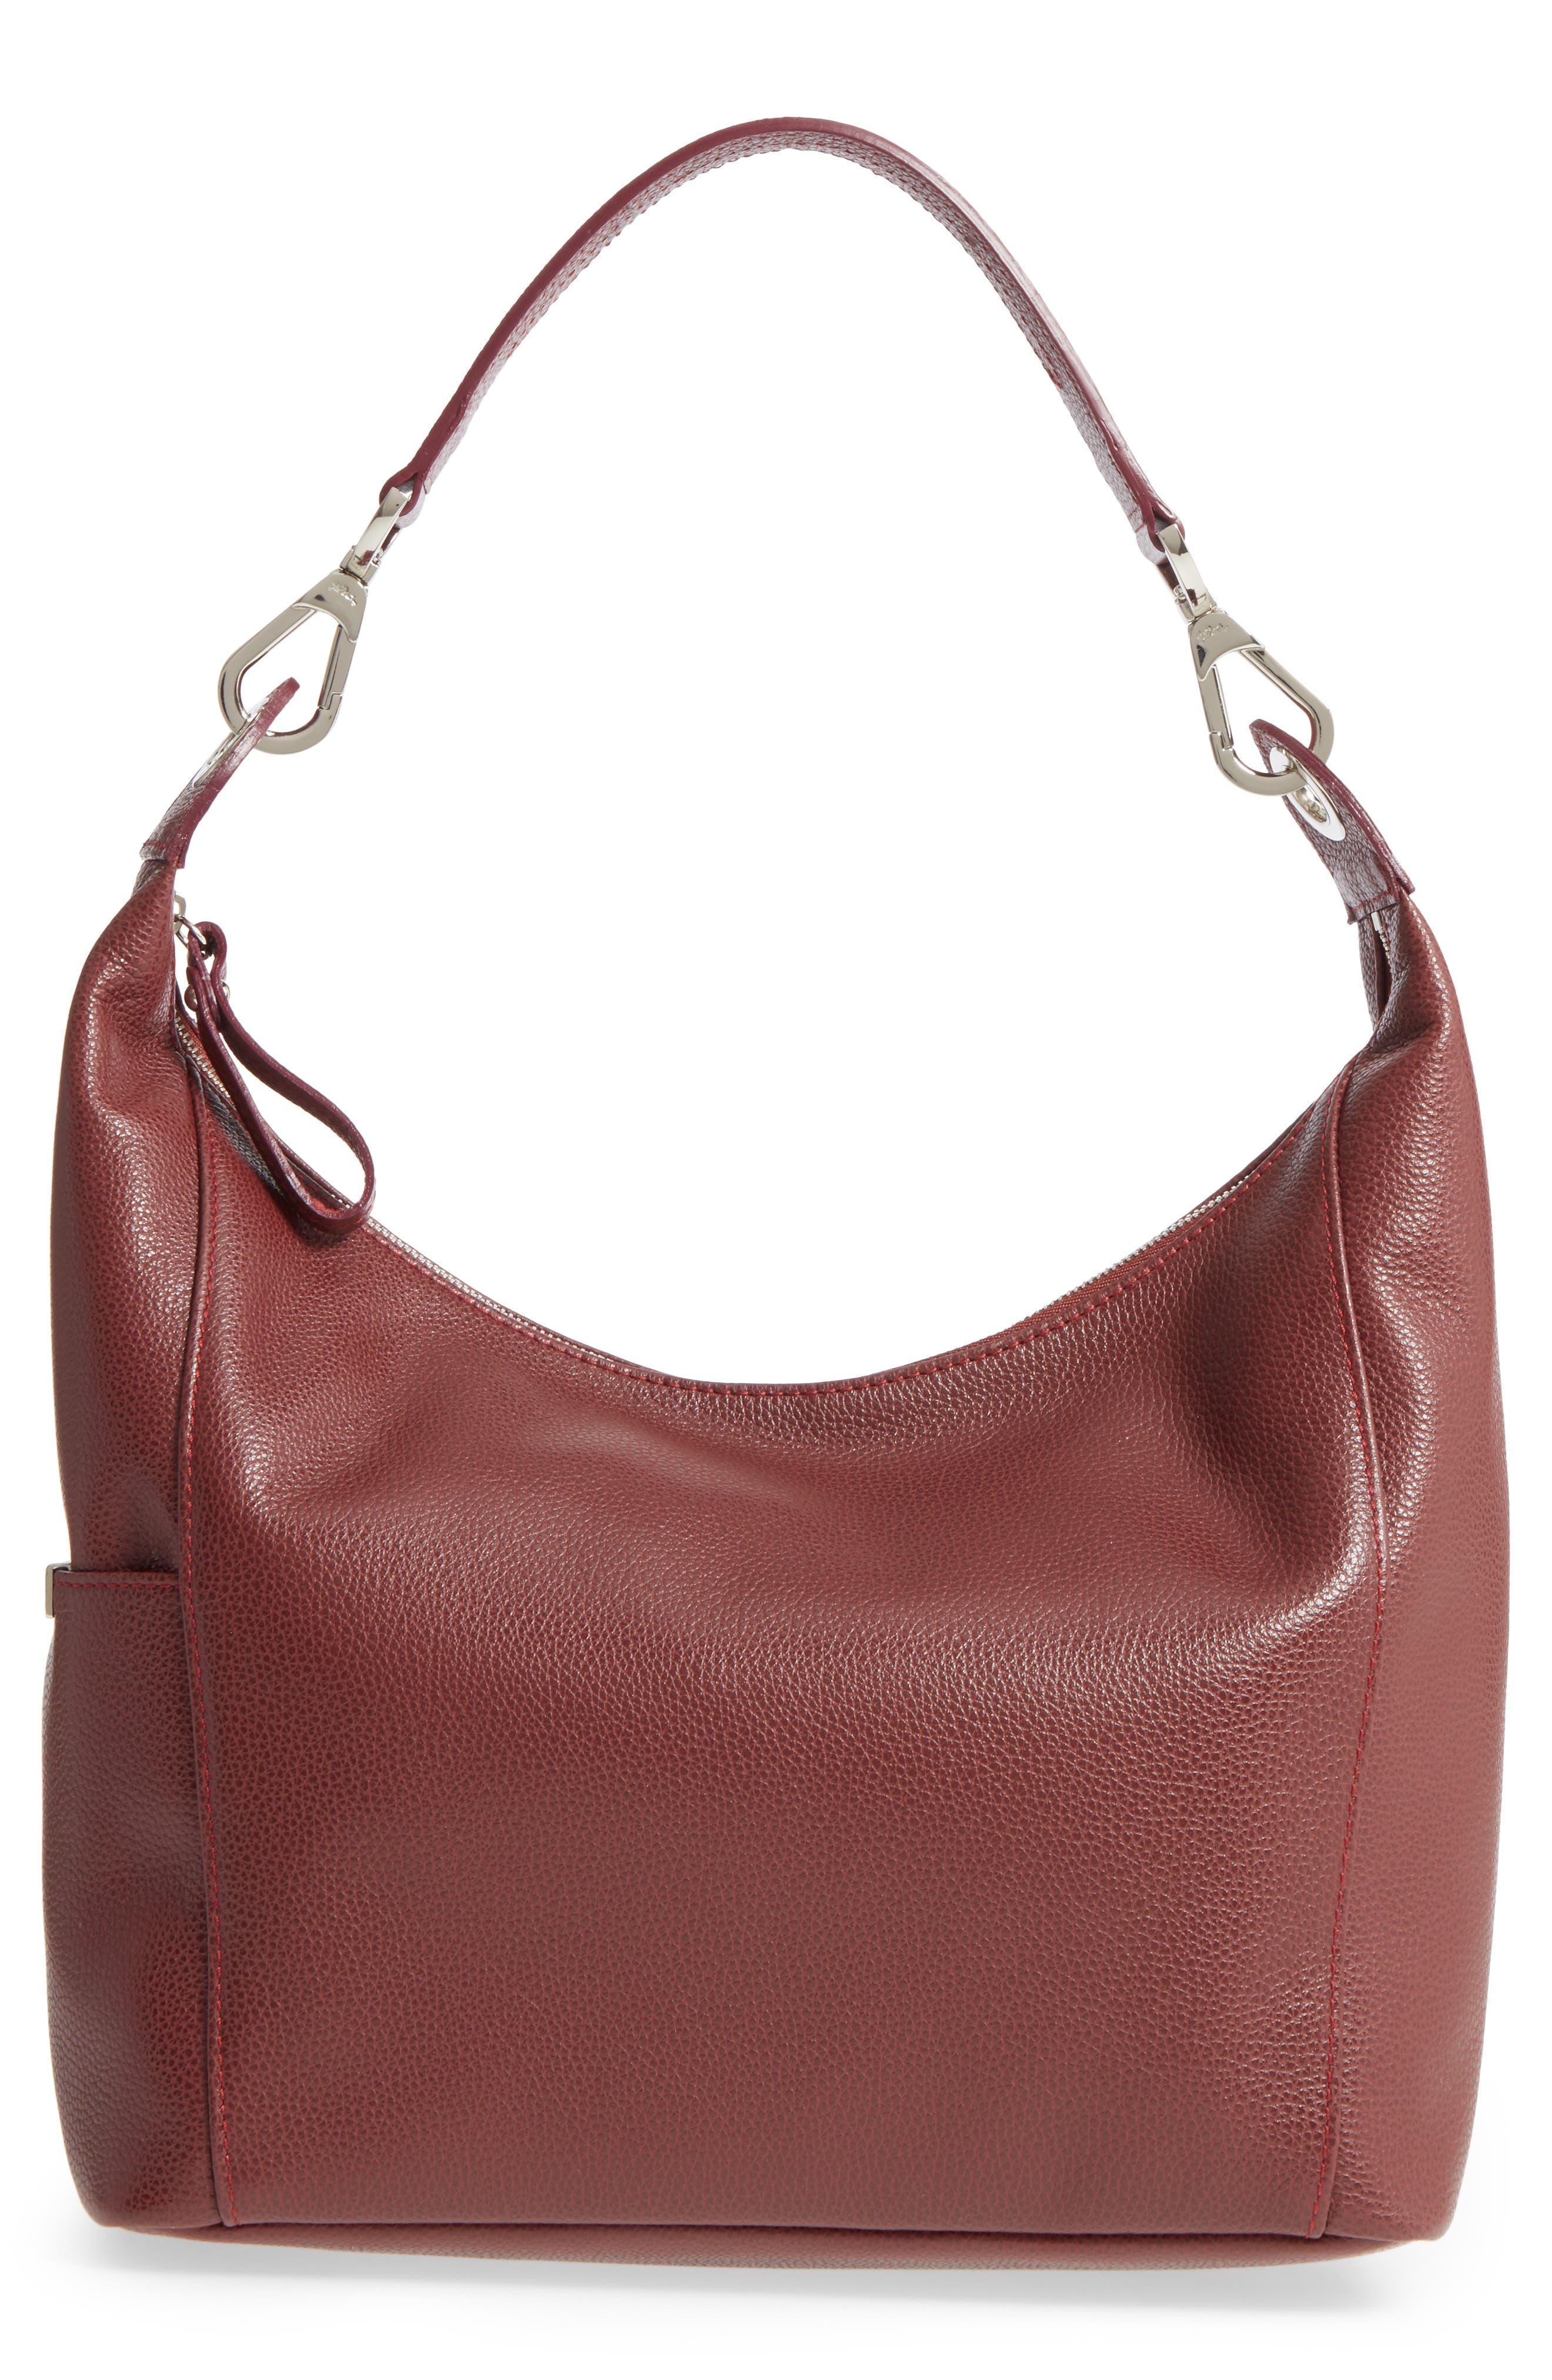 'Le Foulonne' Leather Hobo Bag,                             Main thumbnail 1, color,                             618